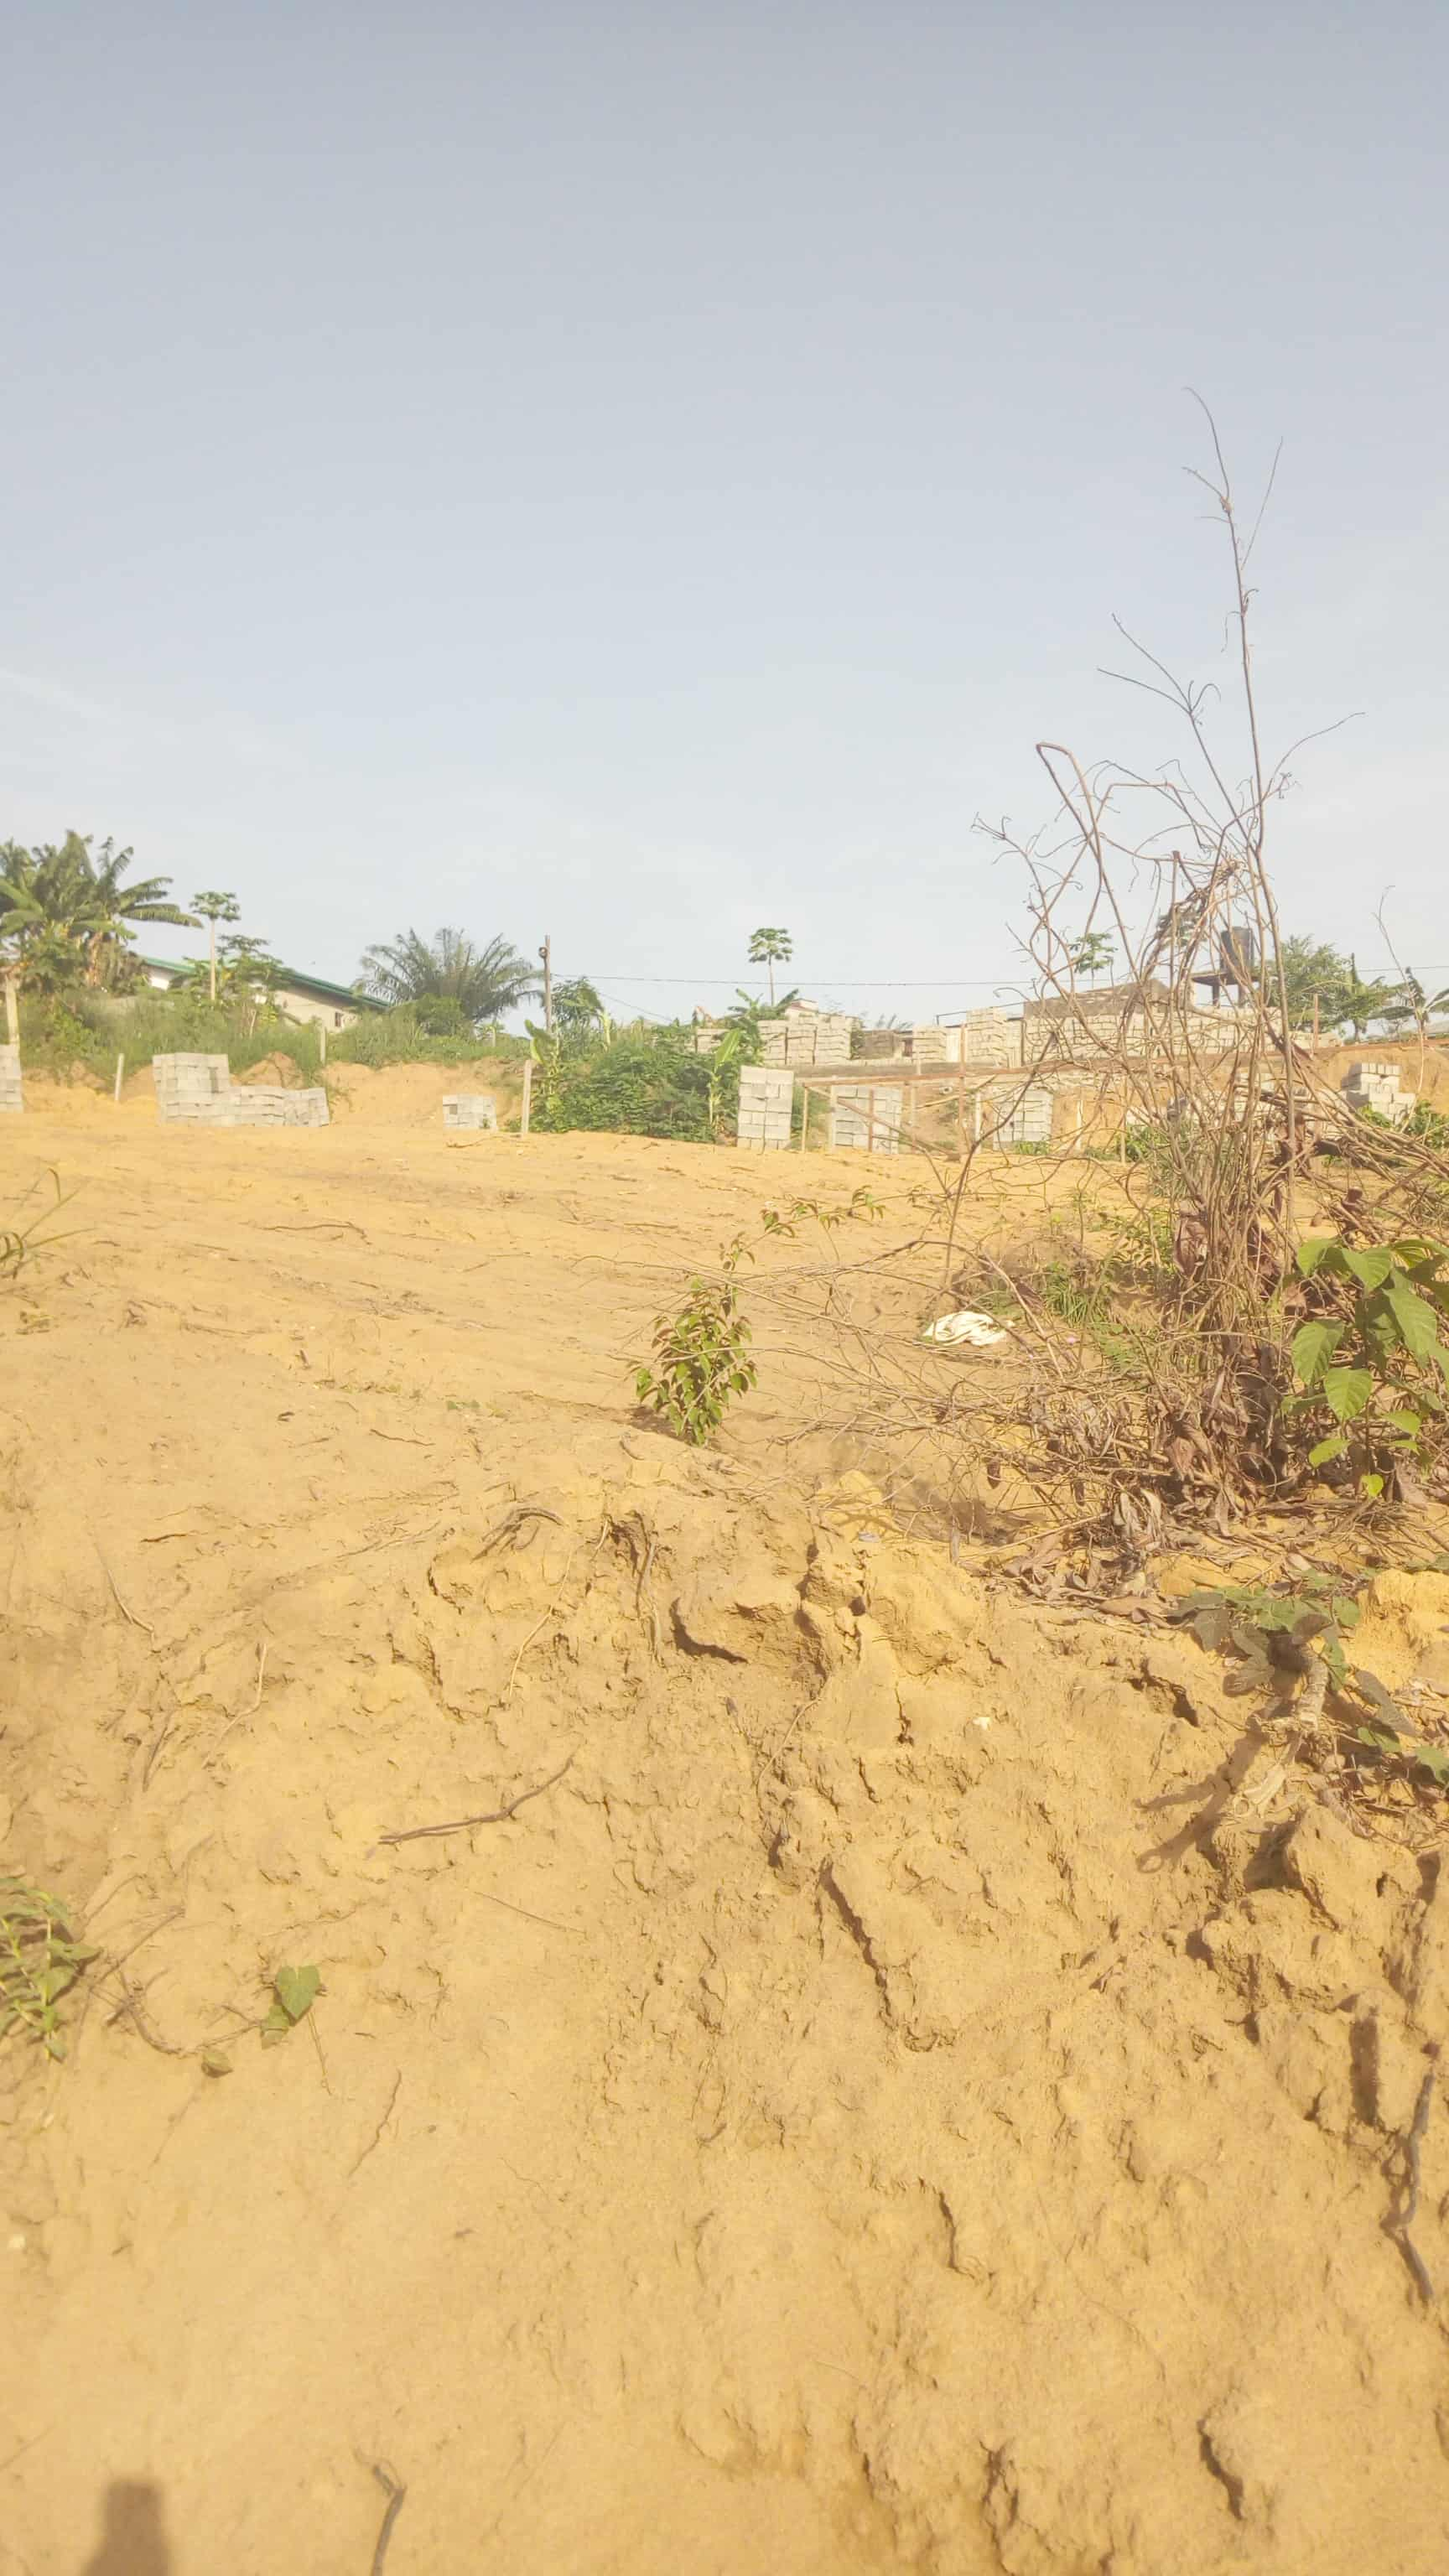 Land for sale at Douala, Logbessou I, Antenne CRTV - 1000 m2 - 50 000 000 FCFA